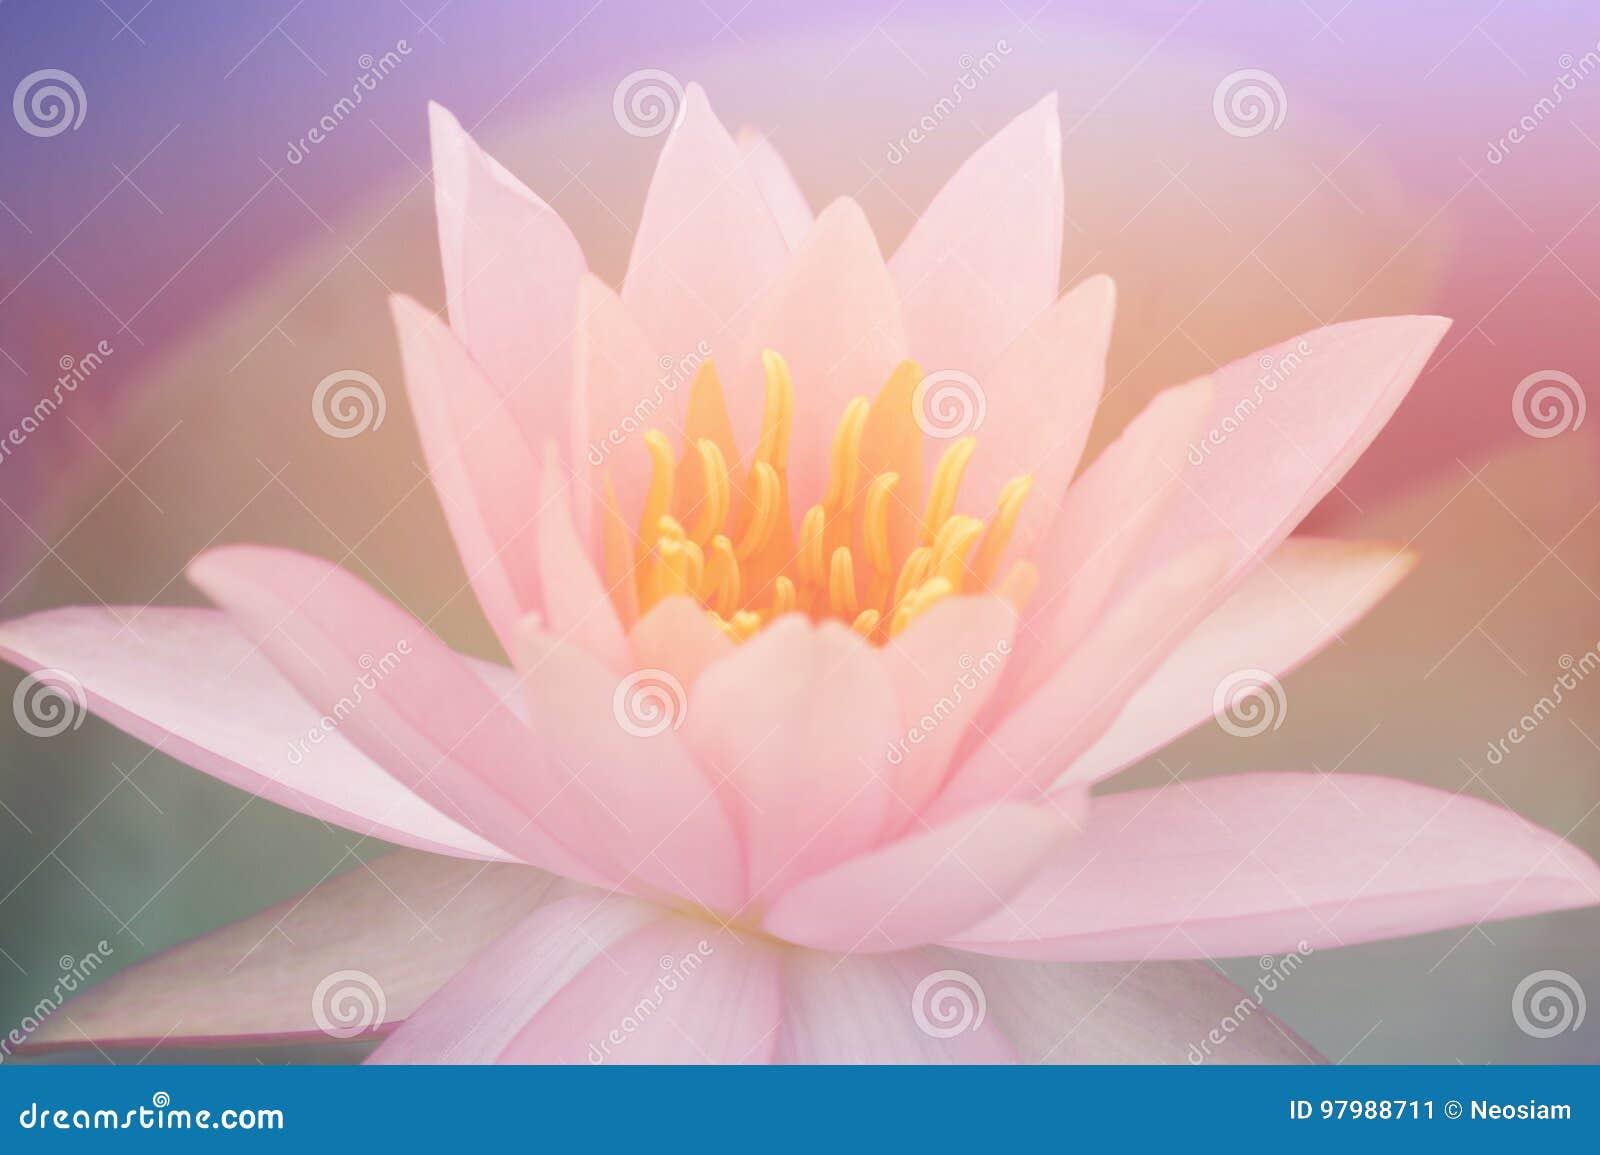 Lotus flowers stock image image of decoration green 97988711 lotus flowers in pastel colors sweet background izmirmasajfo